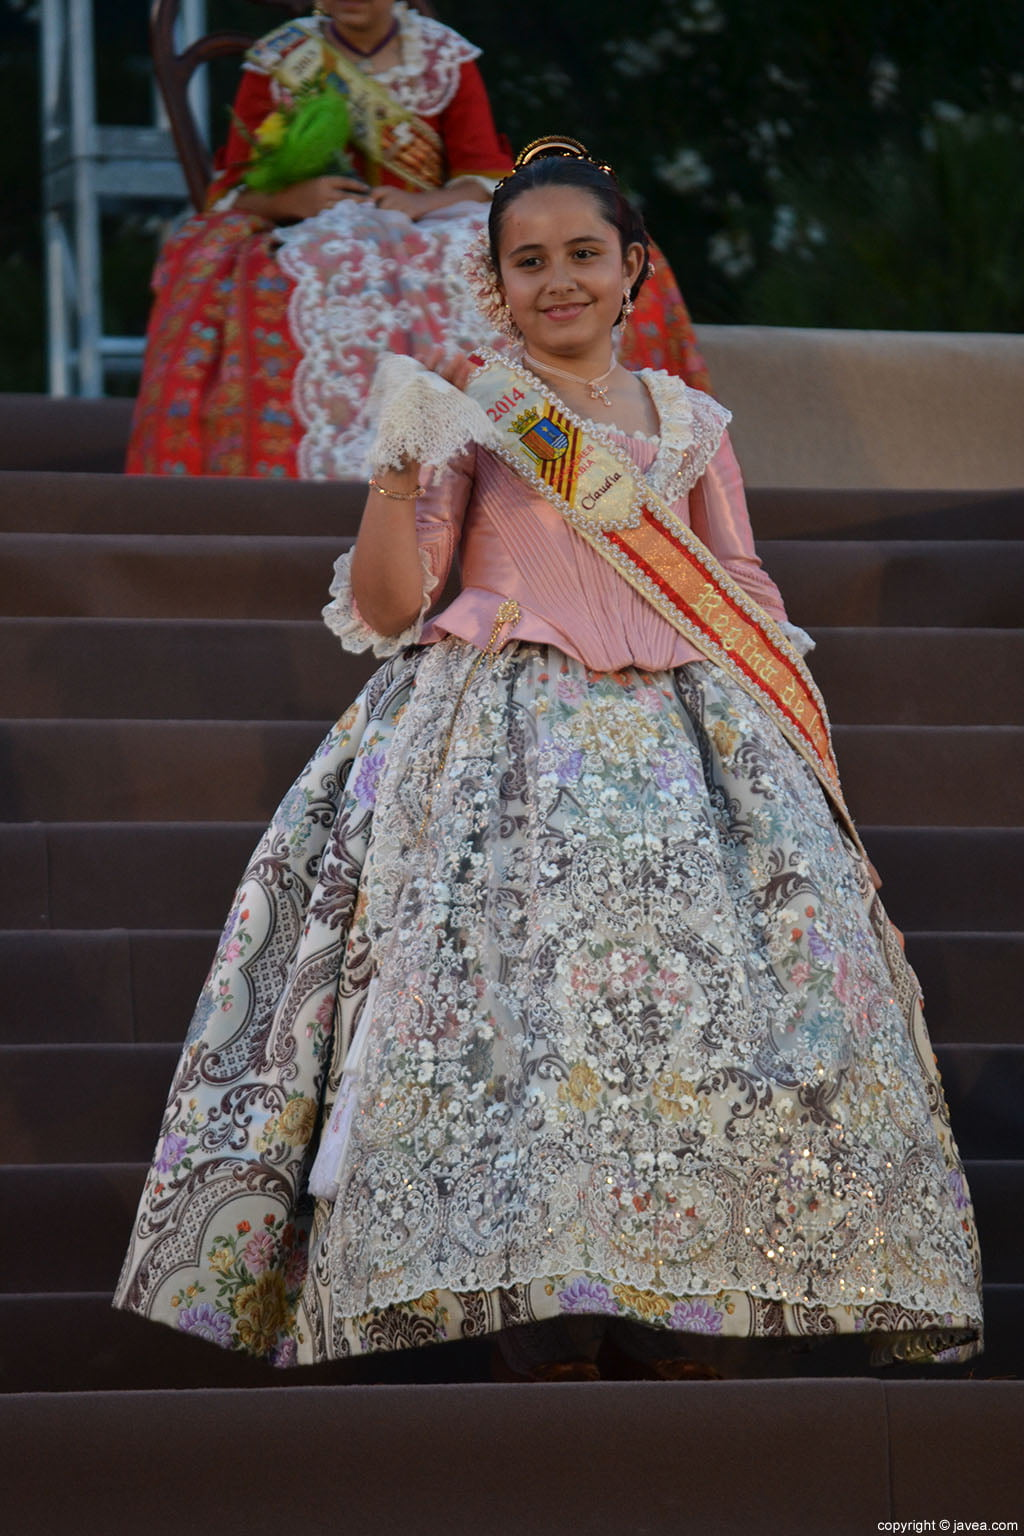 La reina infantil de Fogueres 2014, Claudia Sánchez Tachó